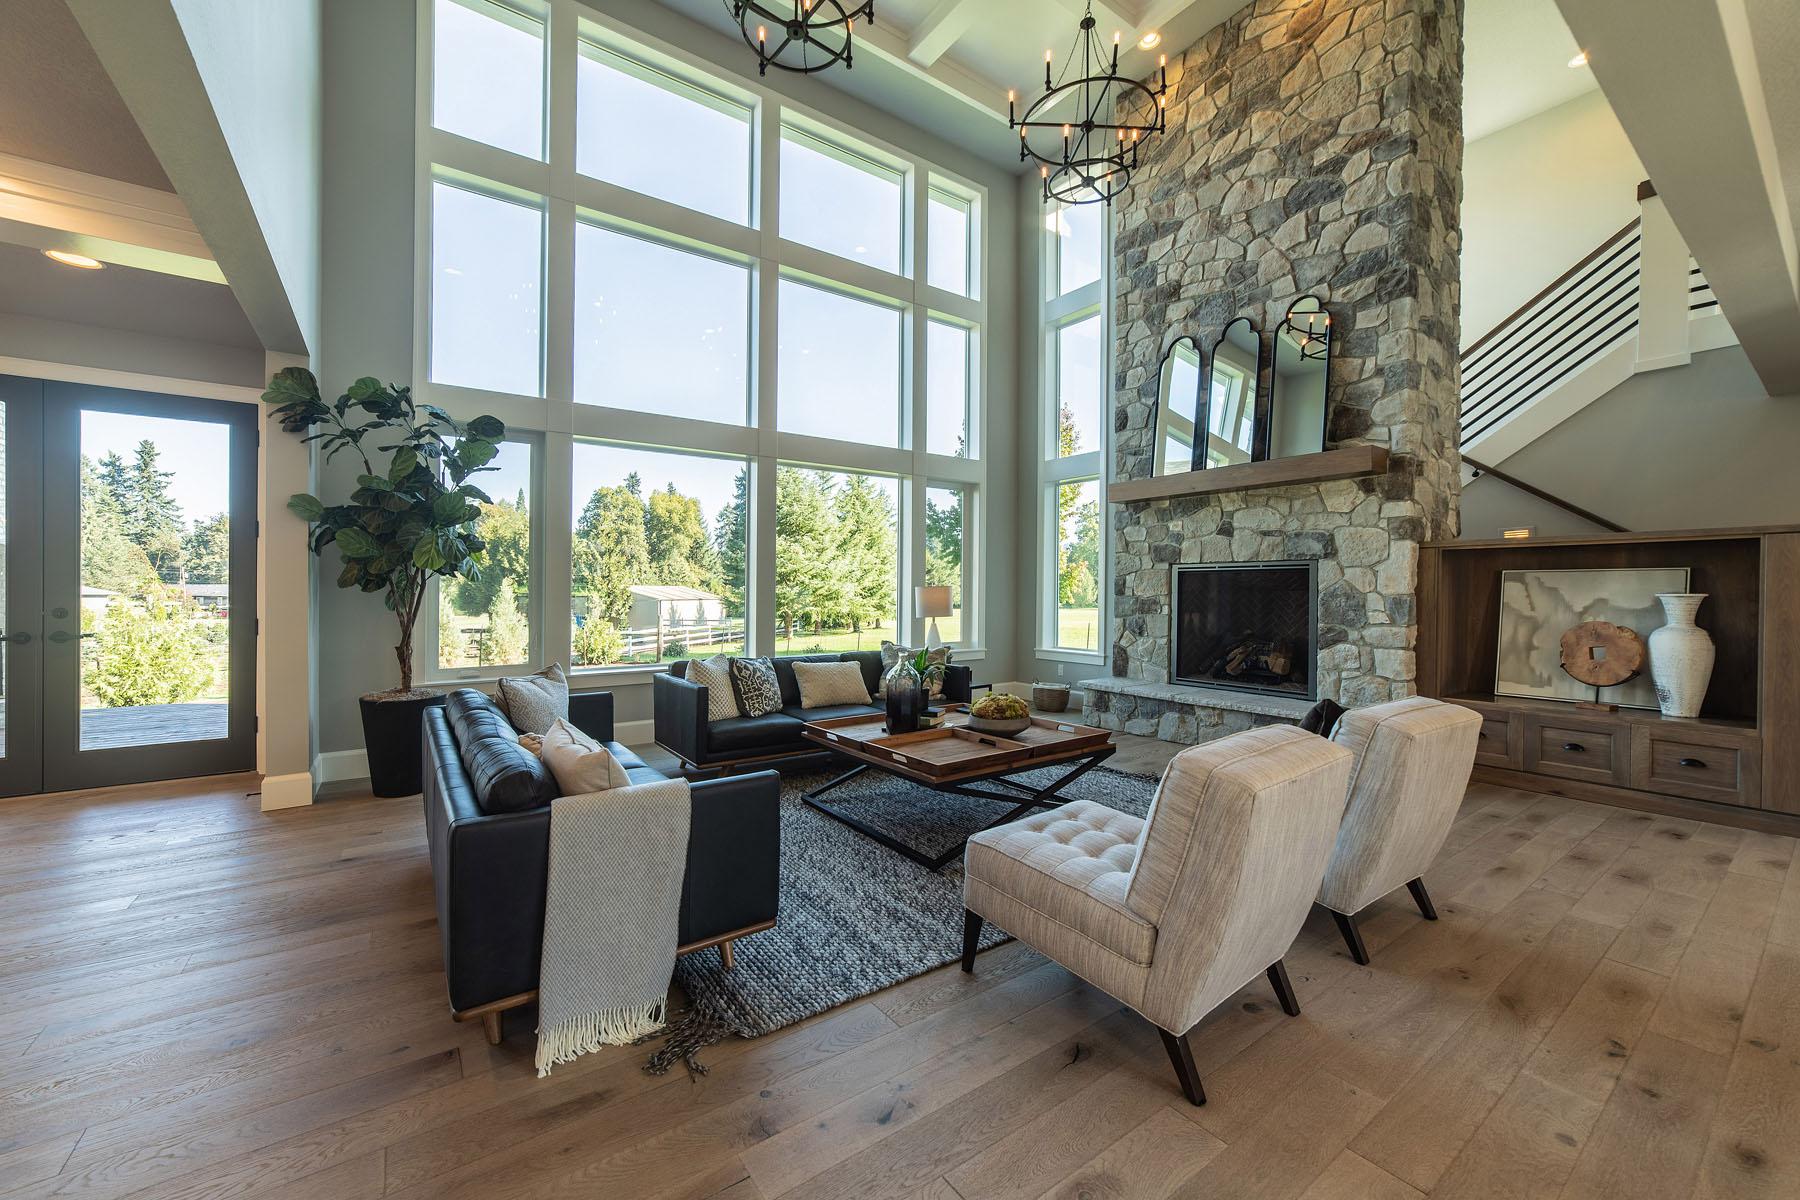 Bosky Dell living room